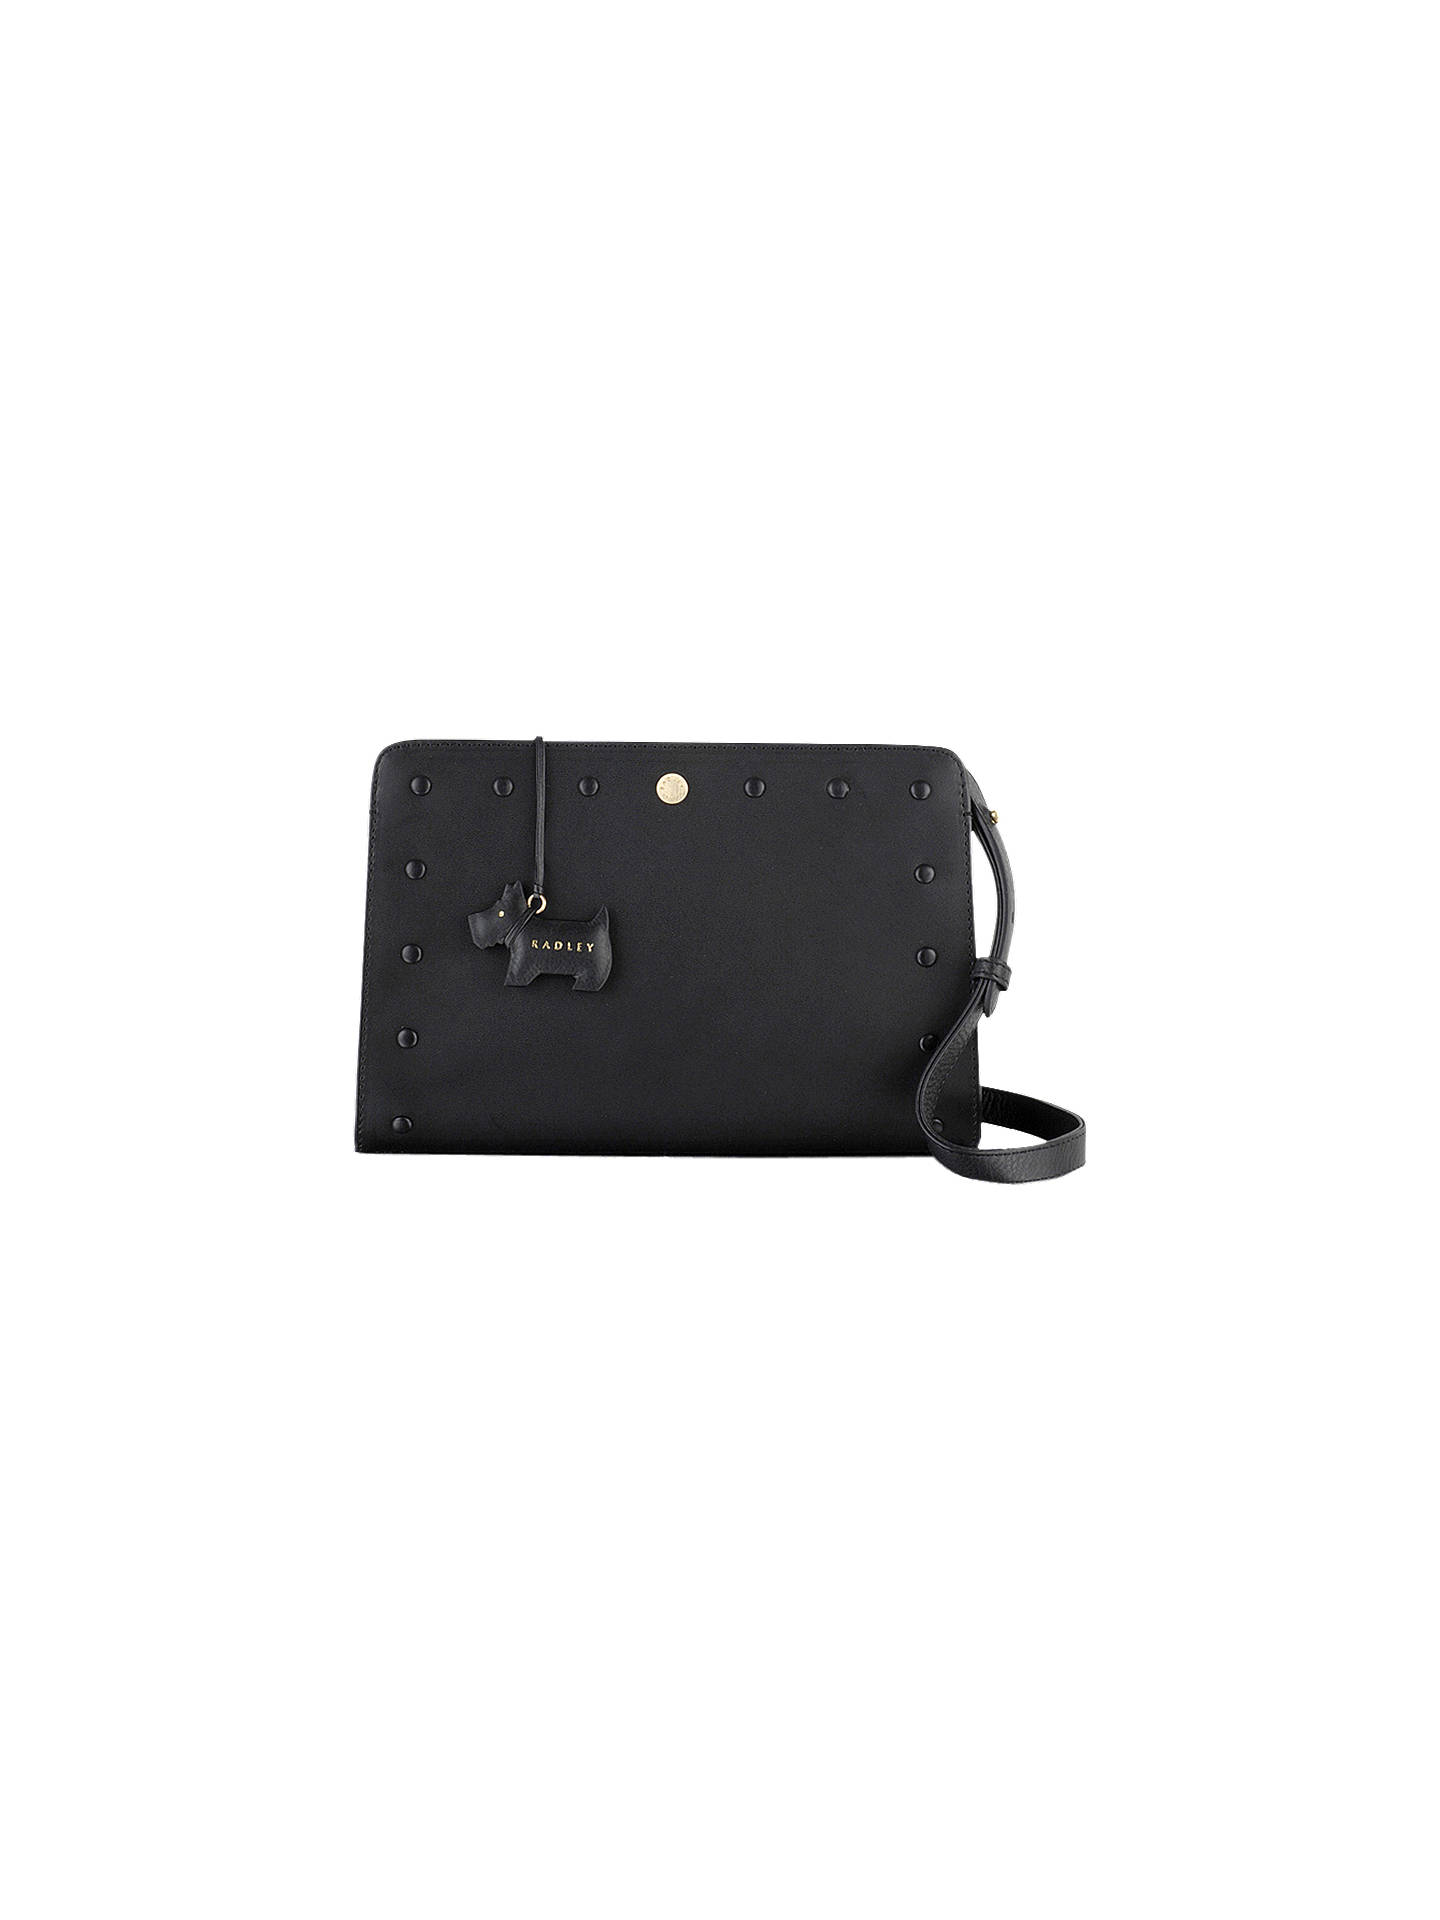 bdab868376 Buy Radley Liverpool Street Leather Medium Stud Cross Body Bag